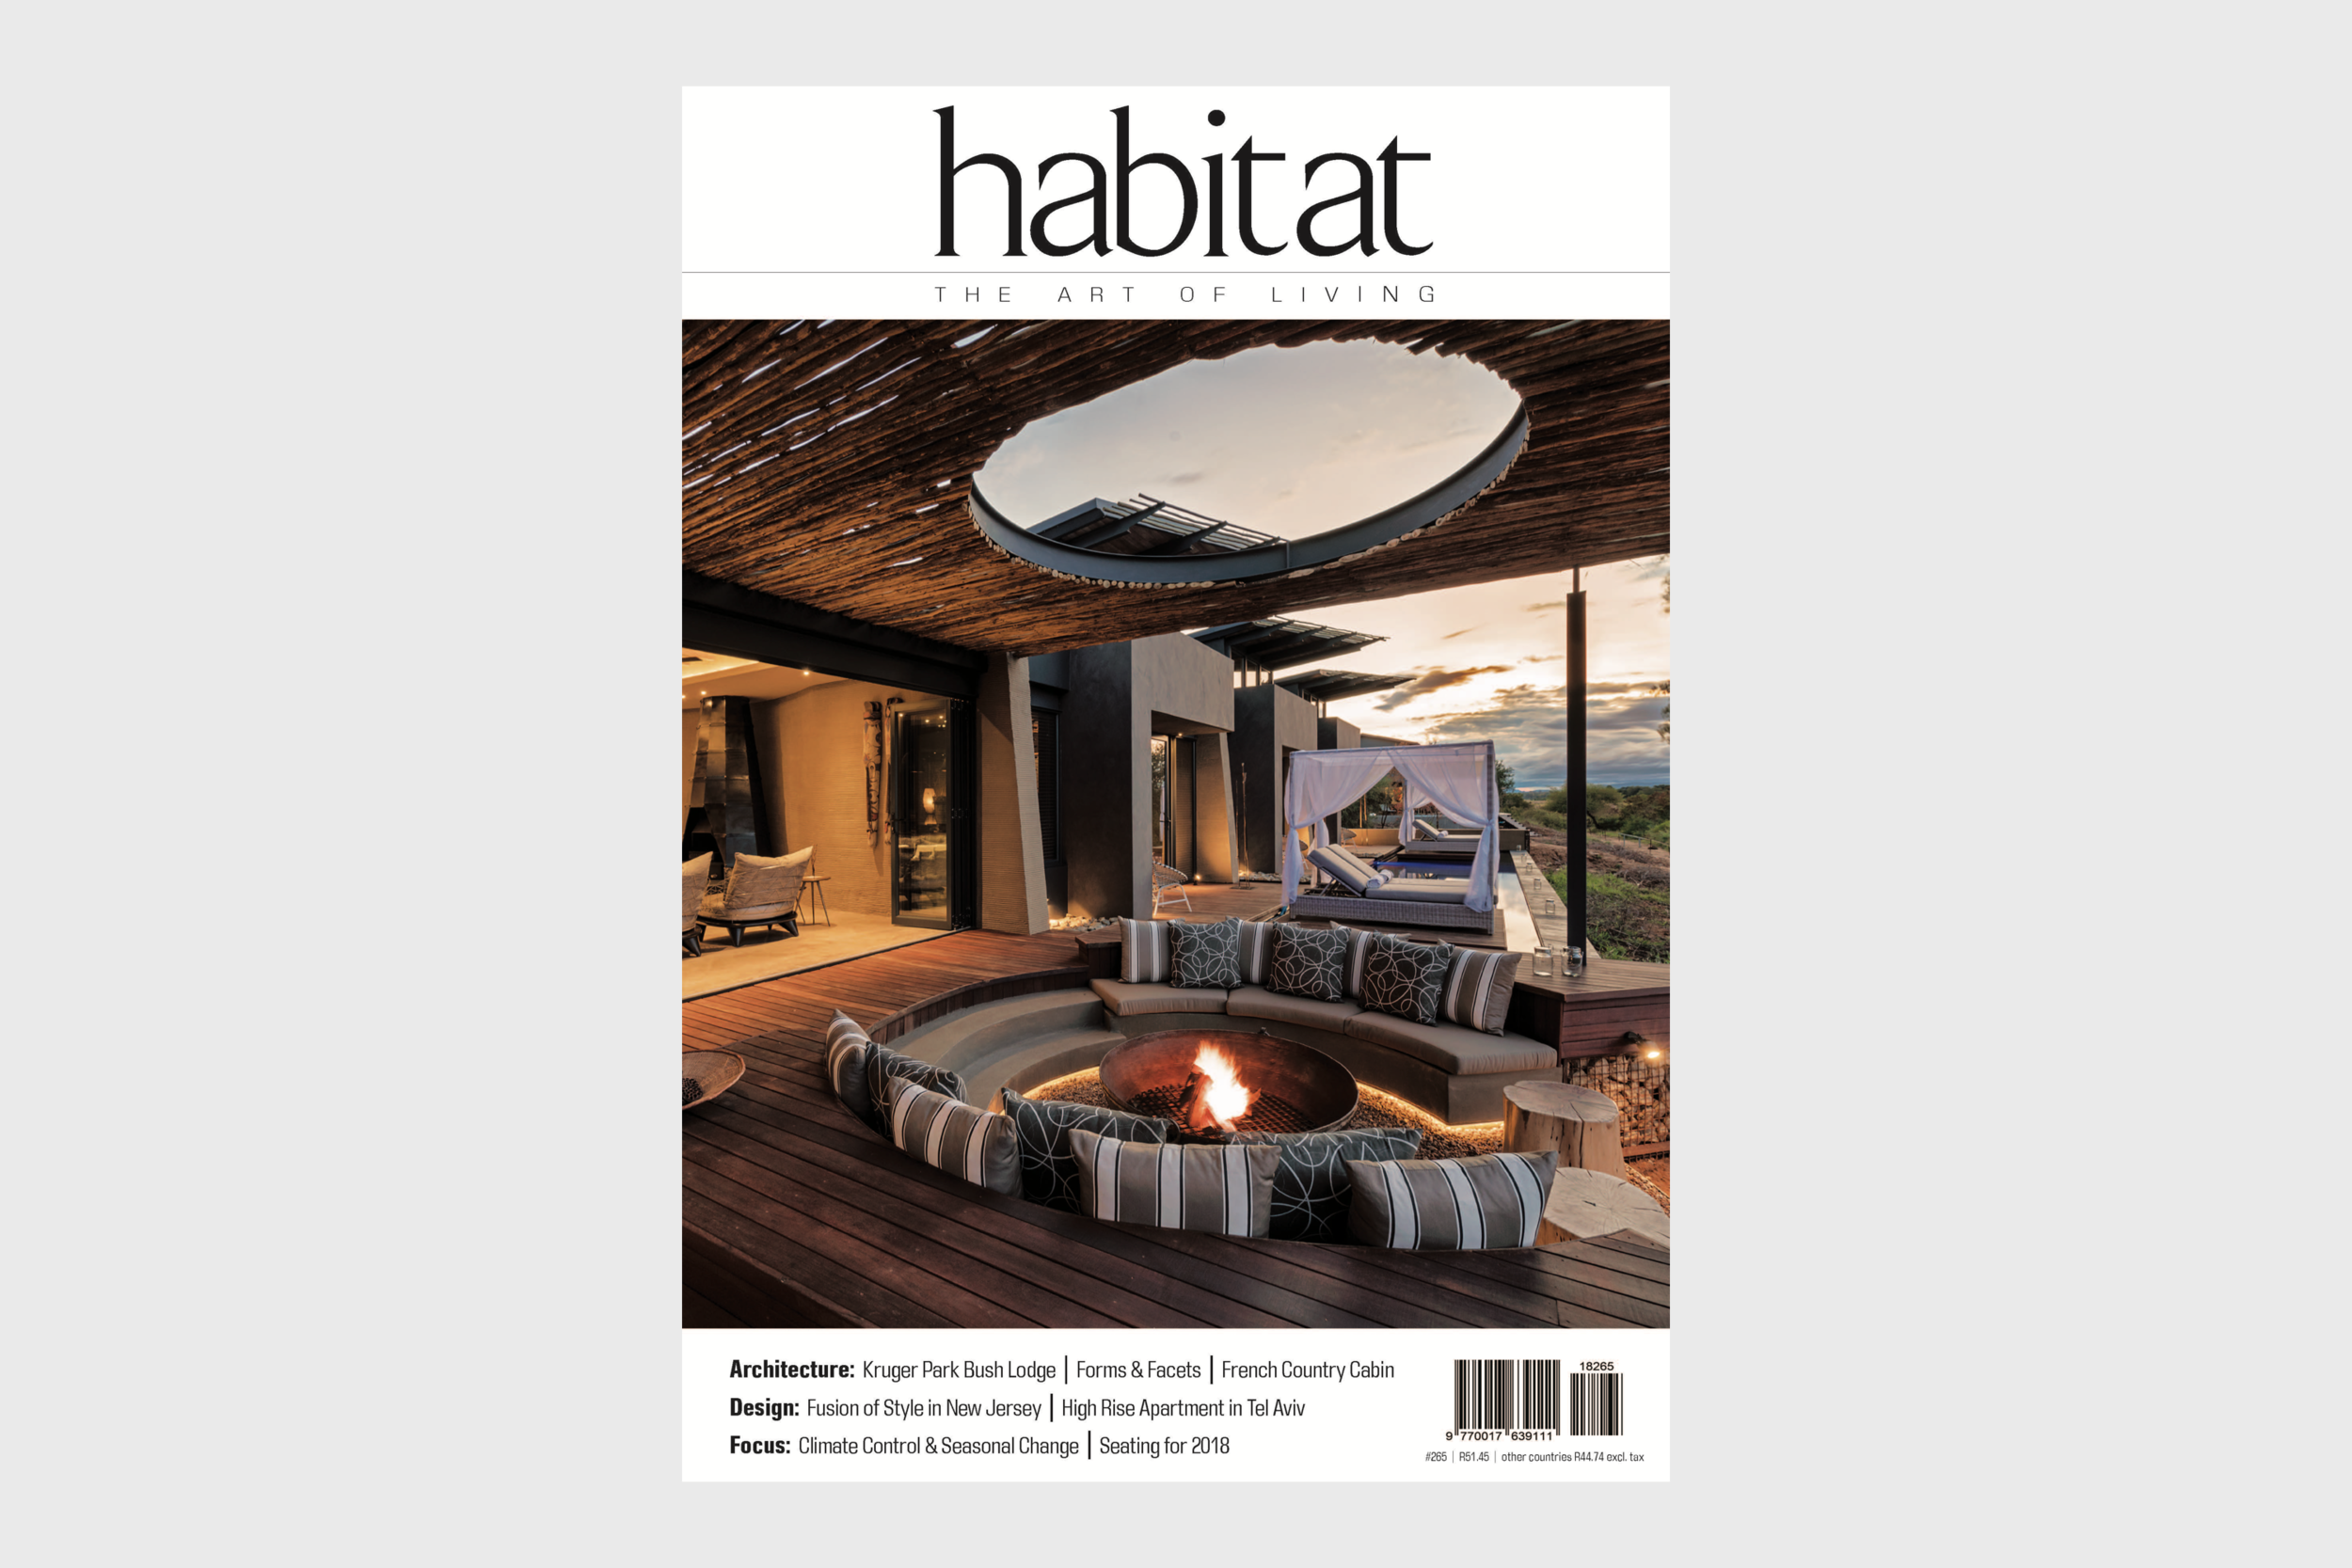 knof_press_habitat_2018-05_01.png